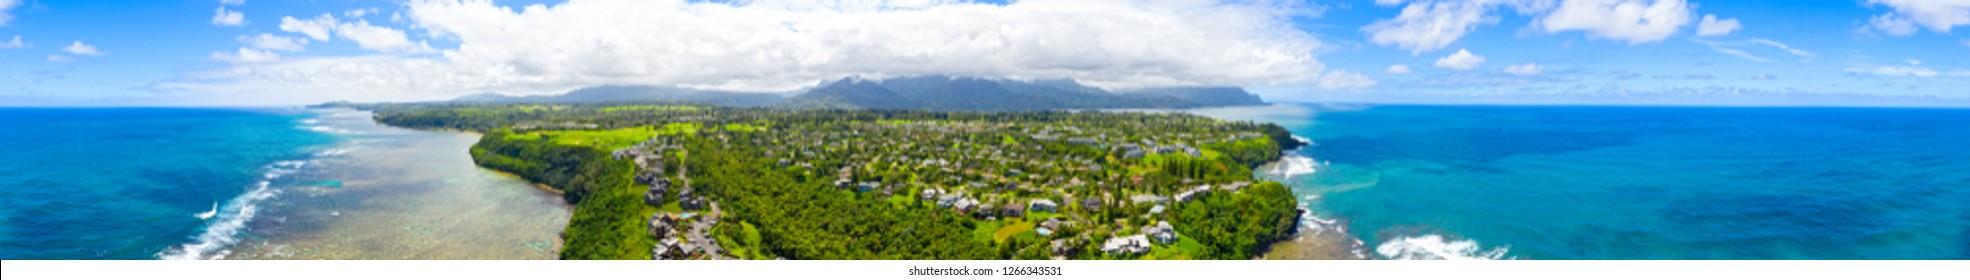 Princeville Kauai Hawaii 360 Aerial Panoramic View